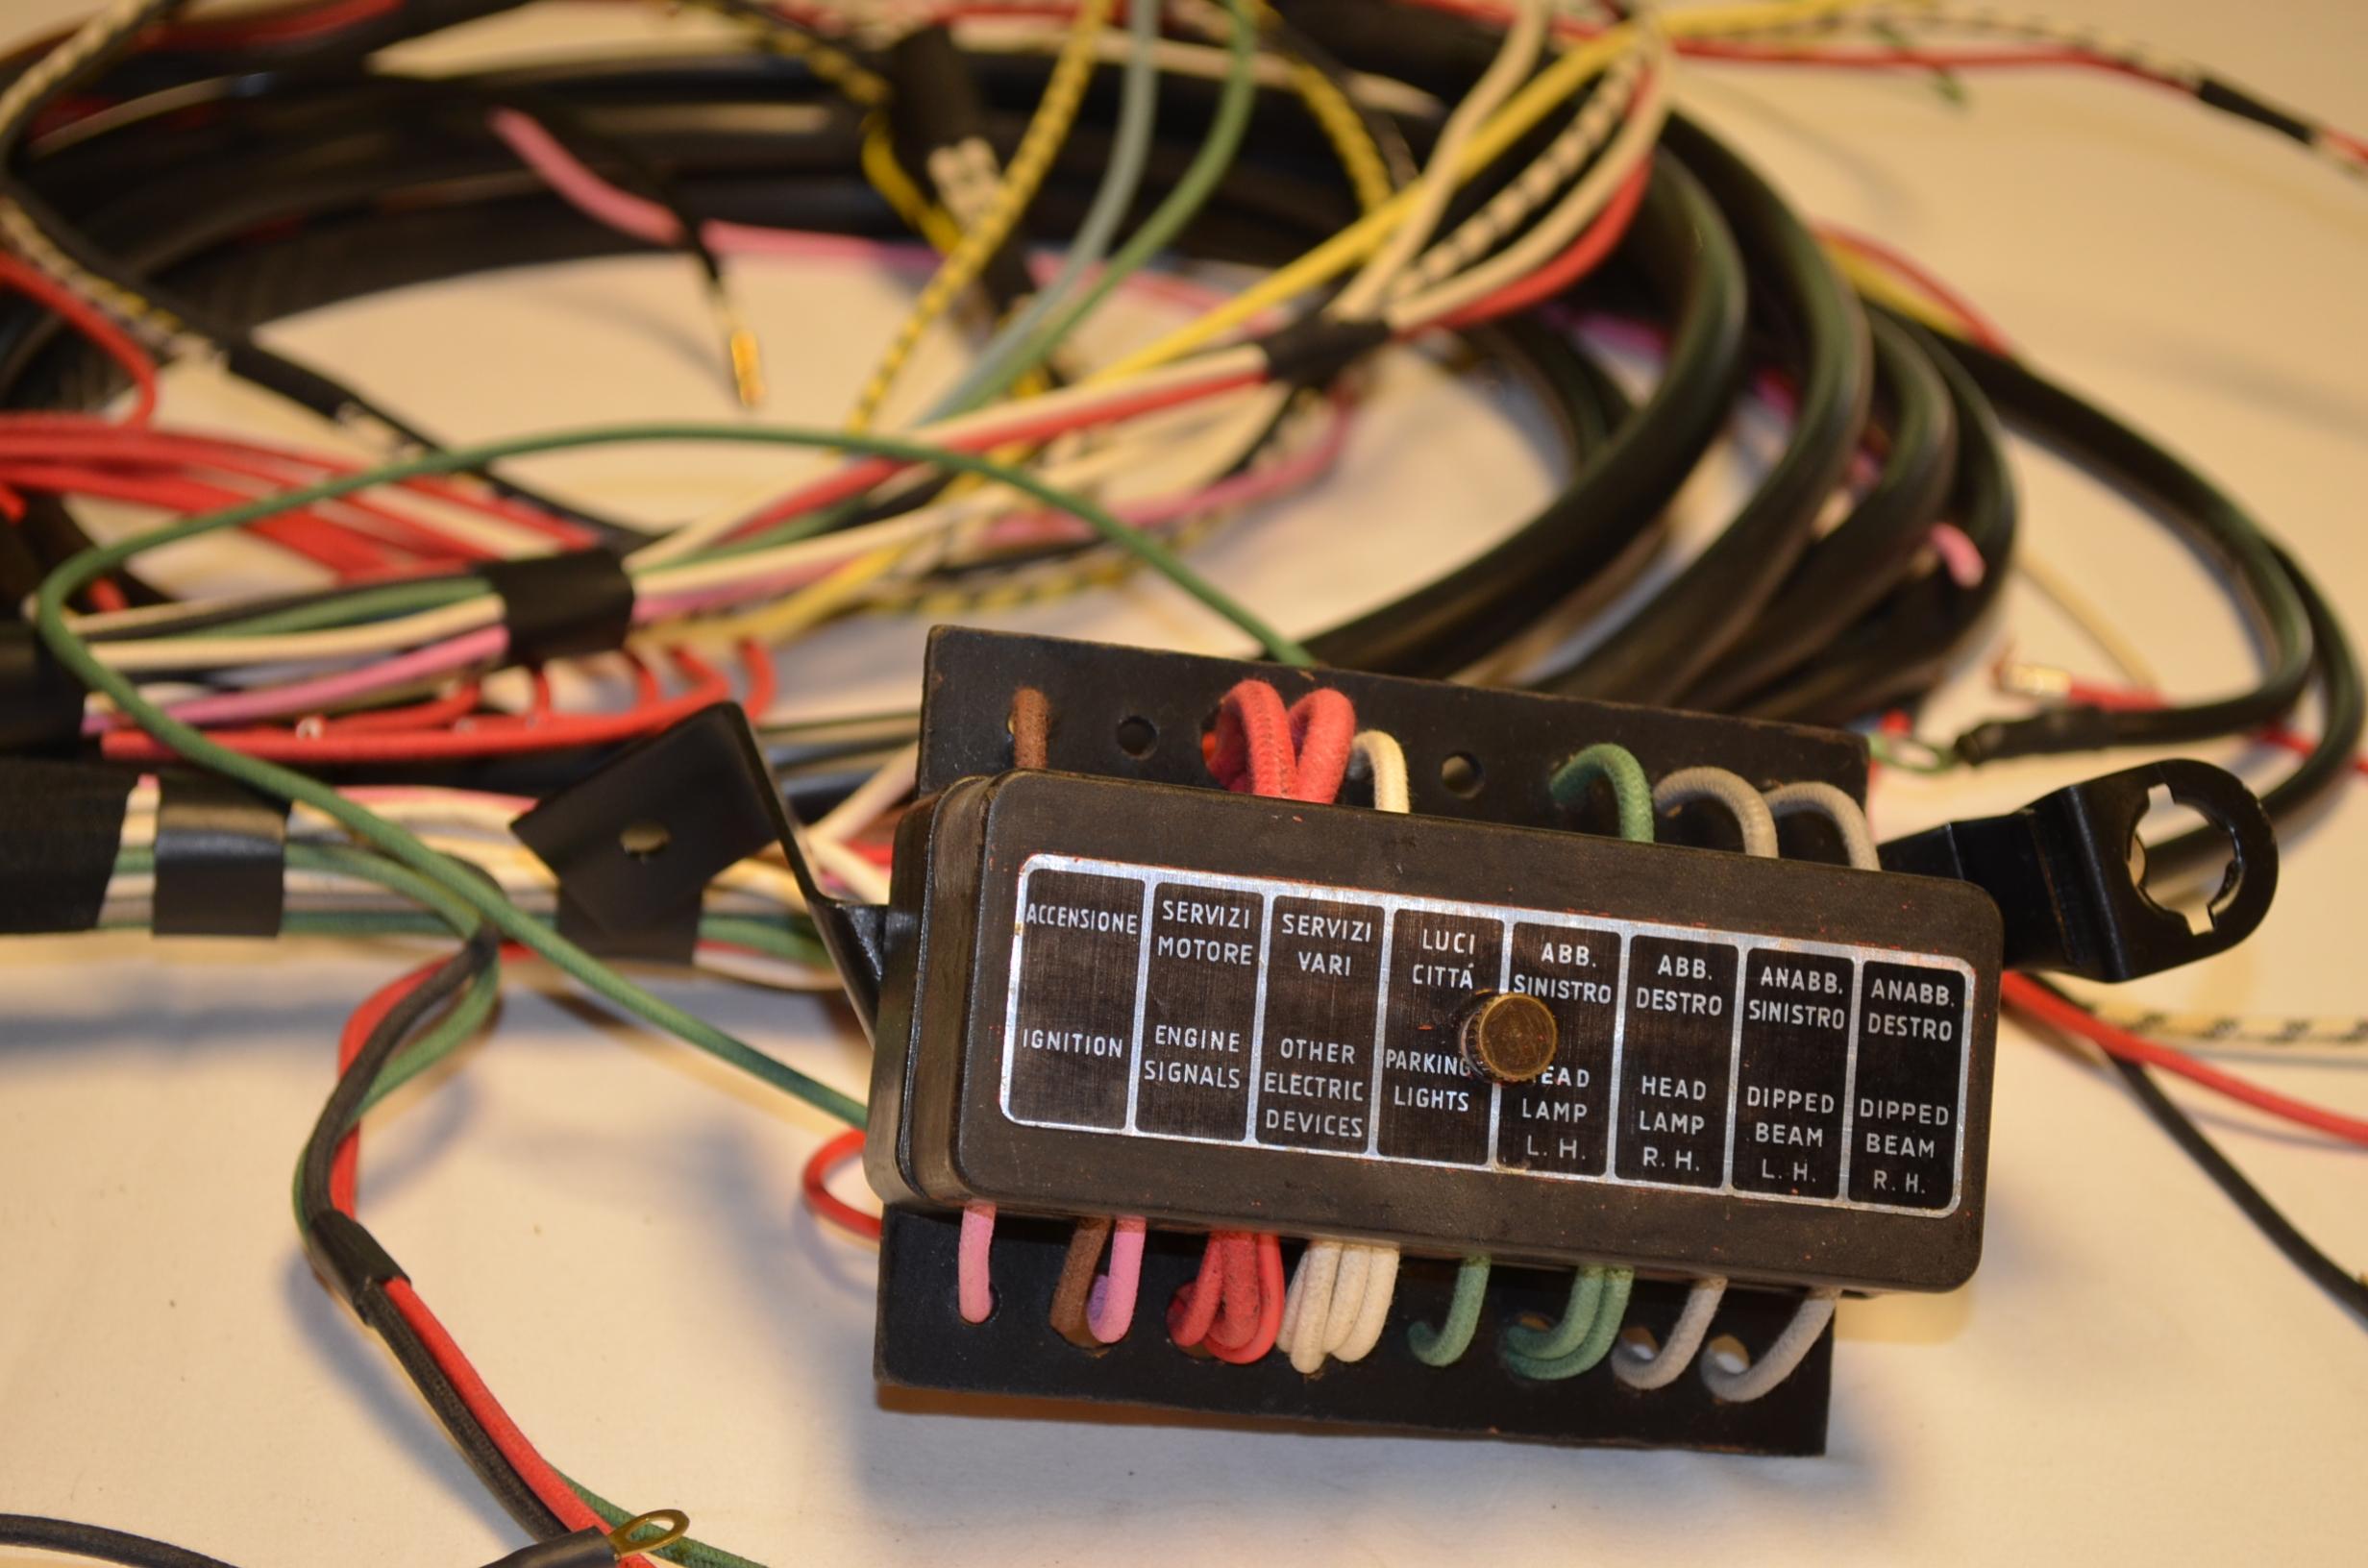 DSC_0031?fit=1200%2C795 wiring looms auto italia sportiva alfa giulietta wiring diagram at arjmand.co